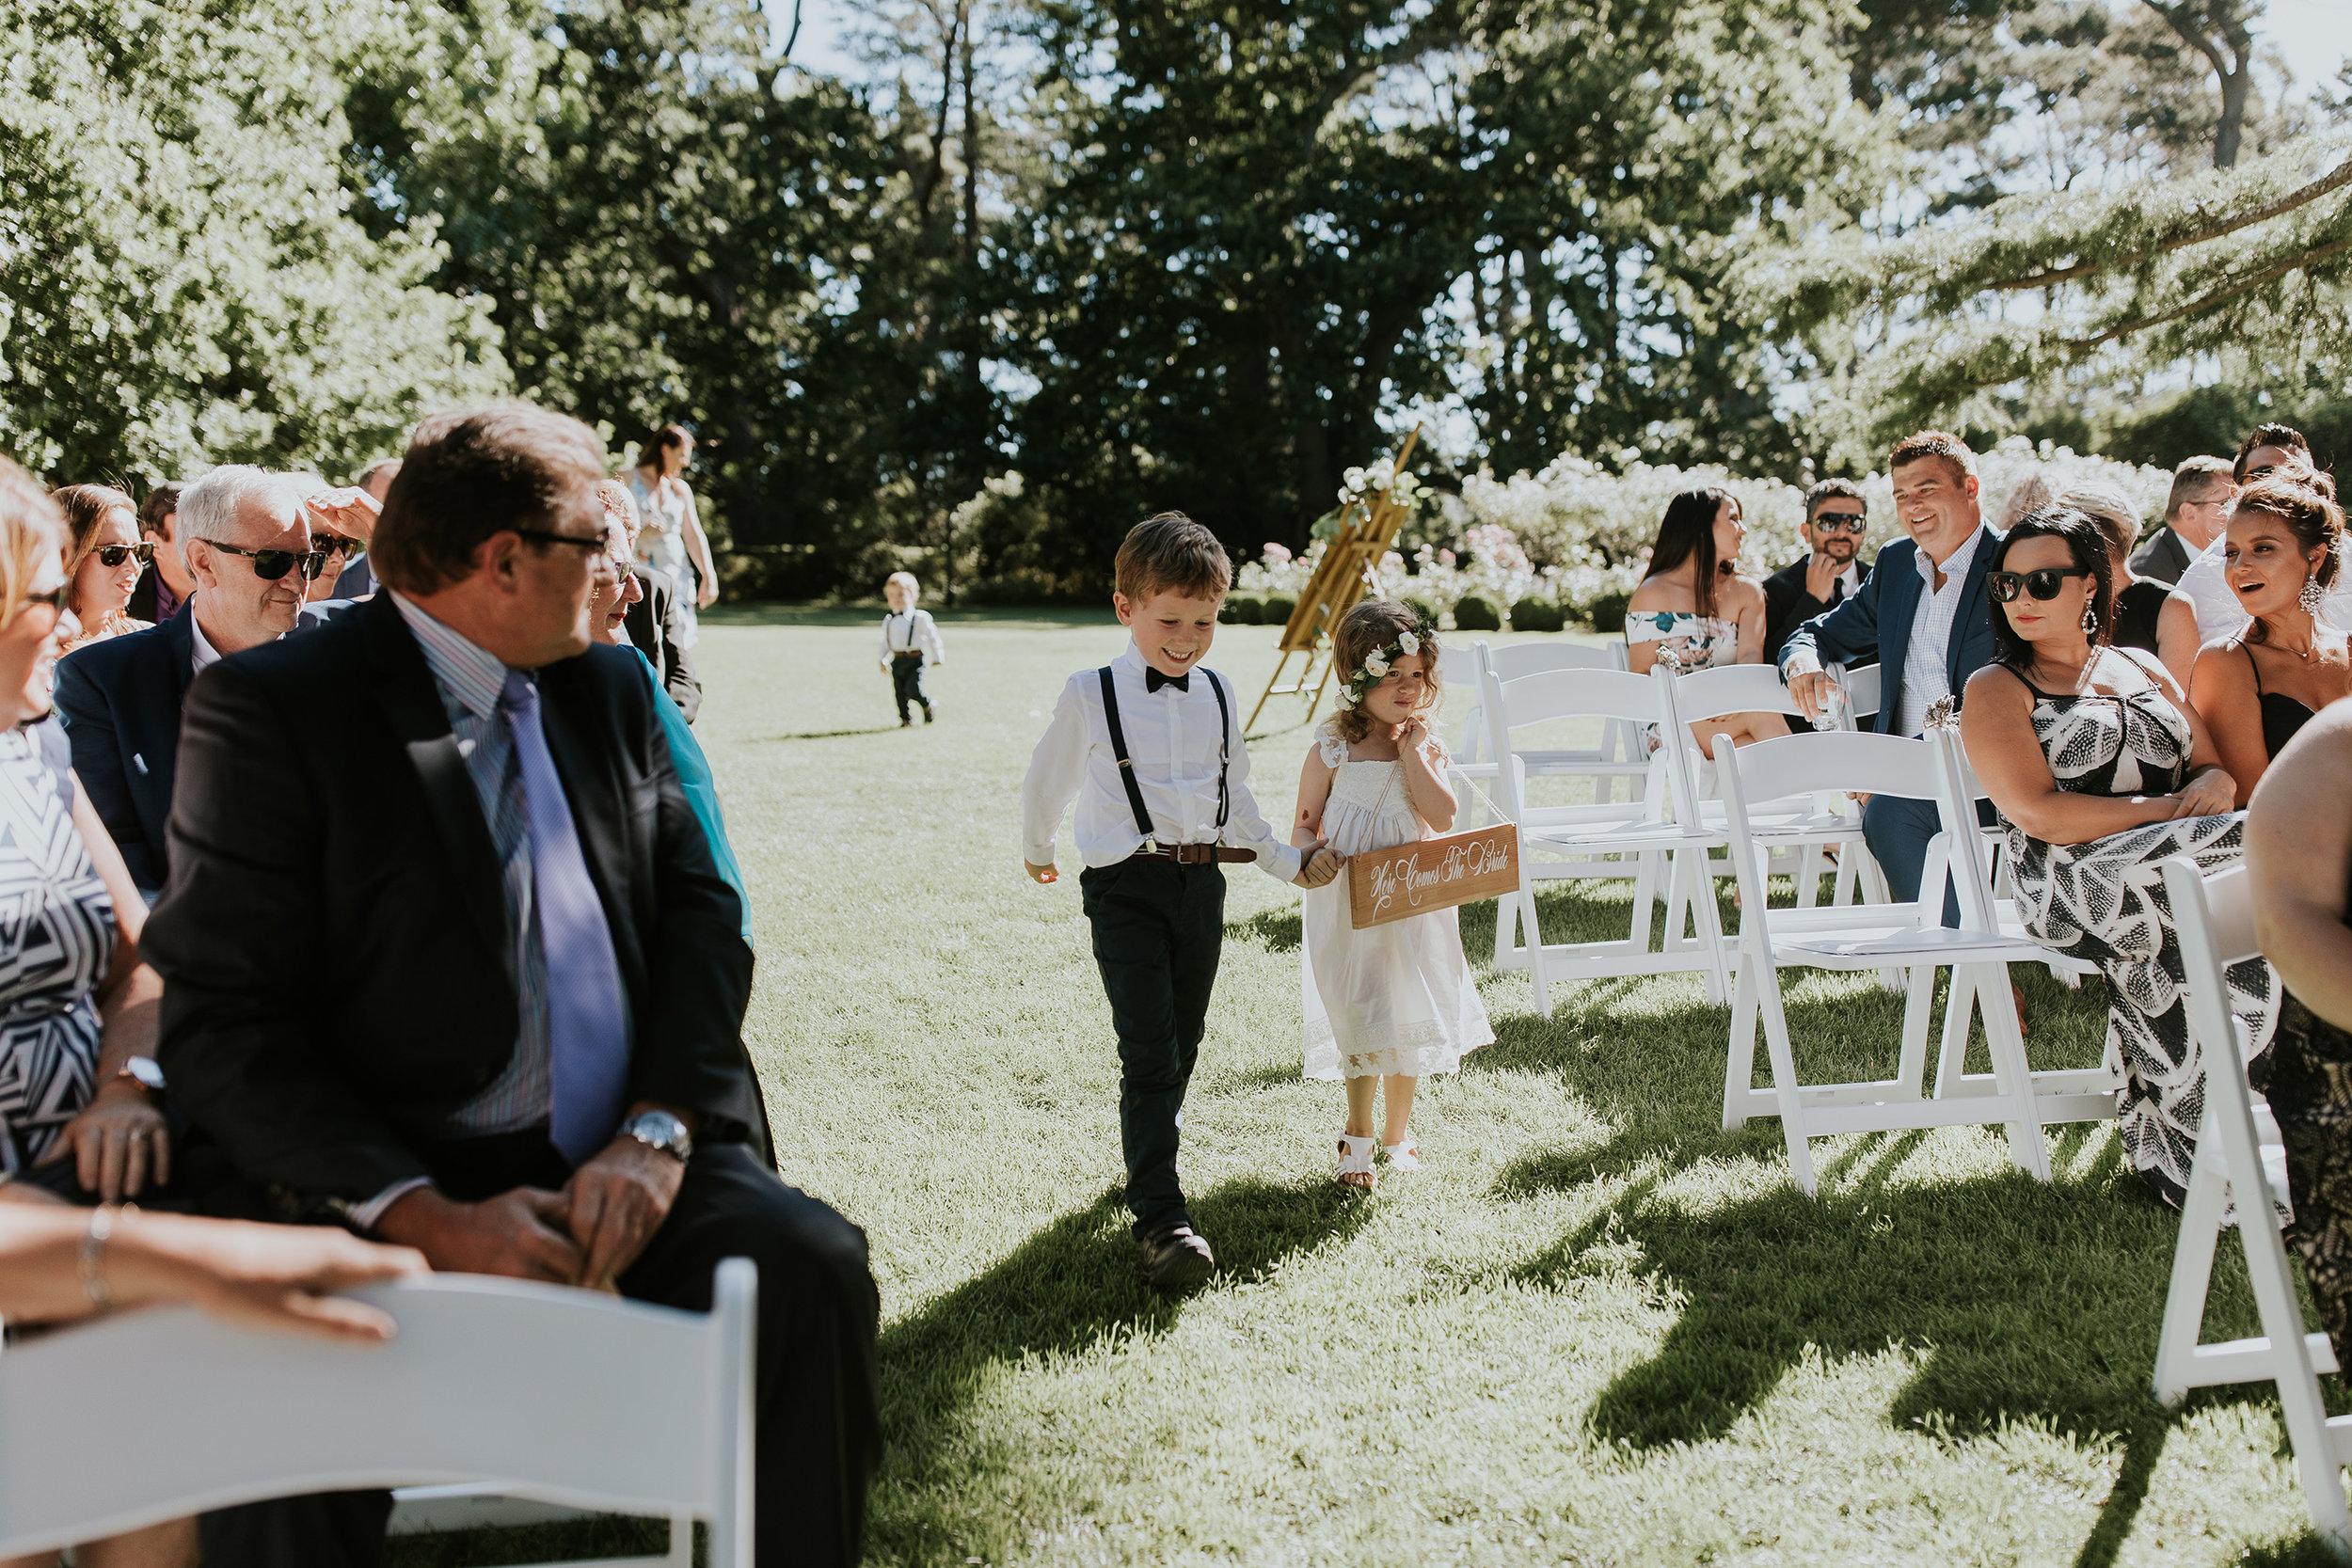 keli-luke-maybury-wedding-129_1.jpg